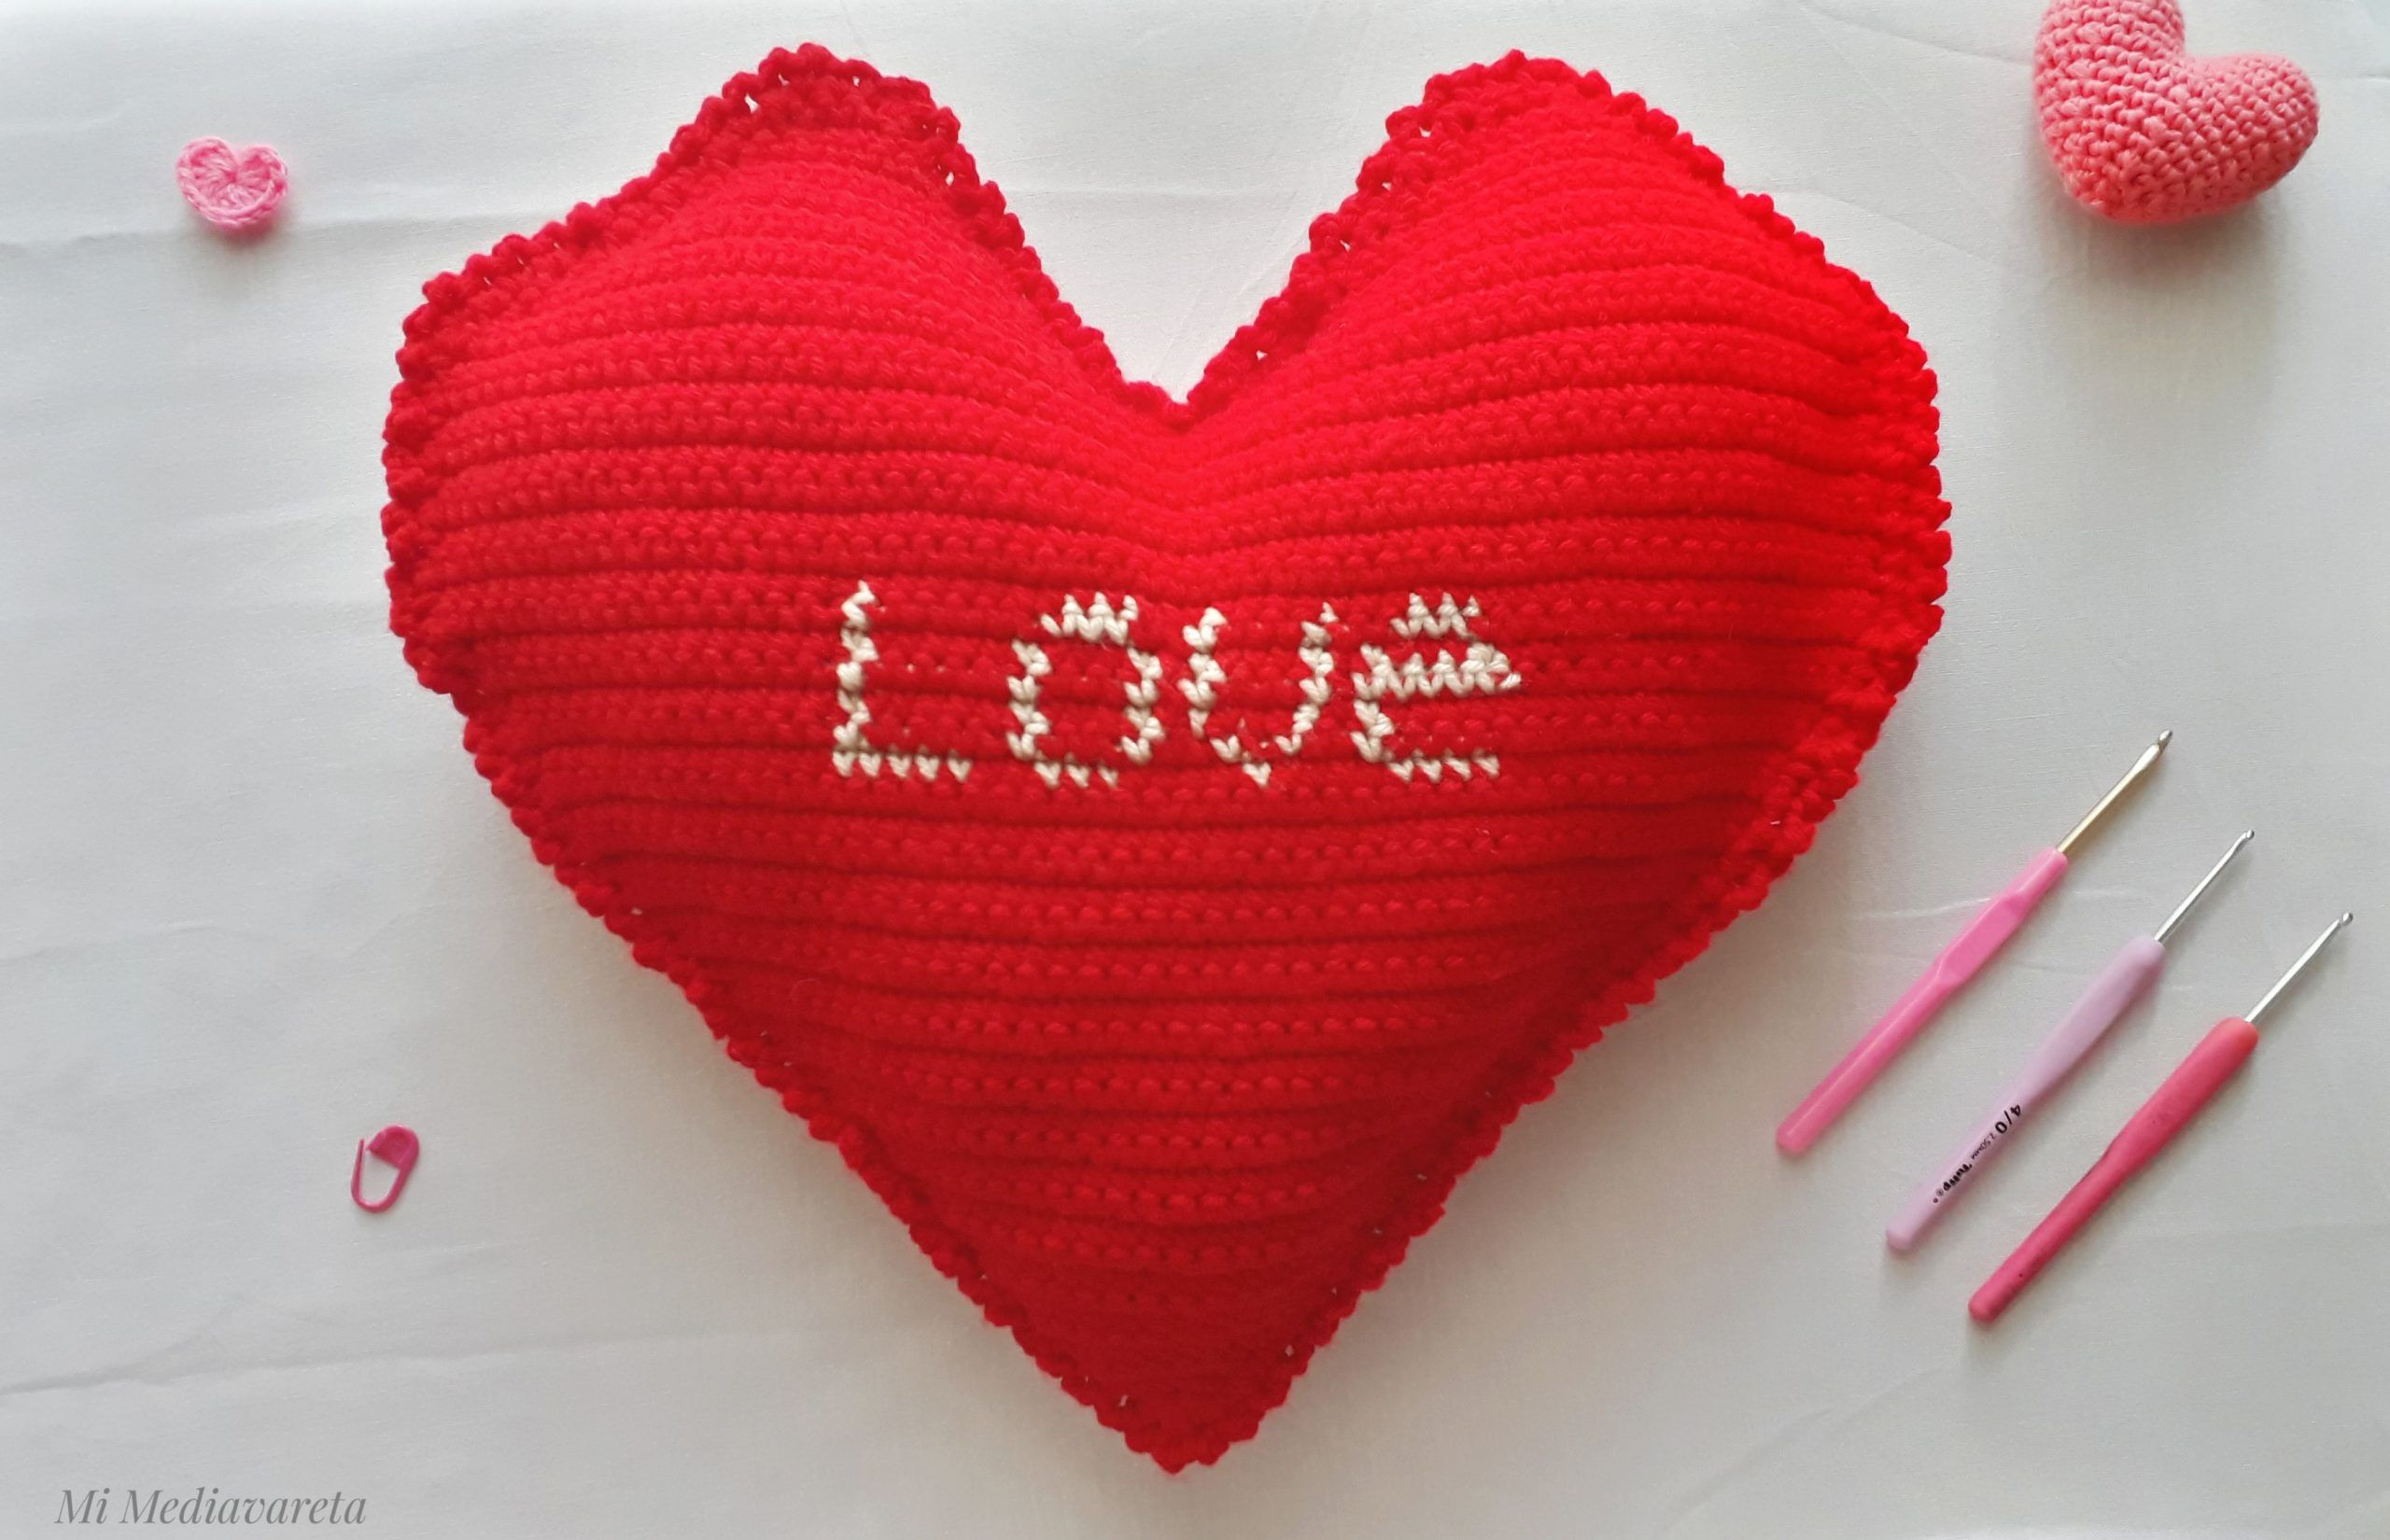 patrón para aprender a tejer un almohadon a crochet con fotos paso a paso